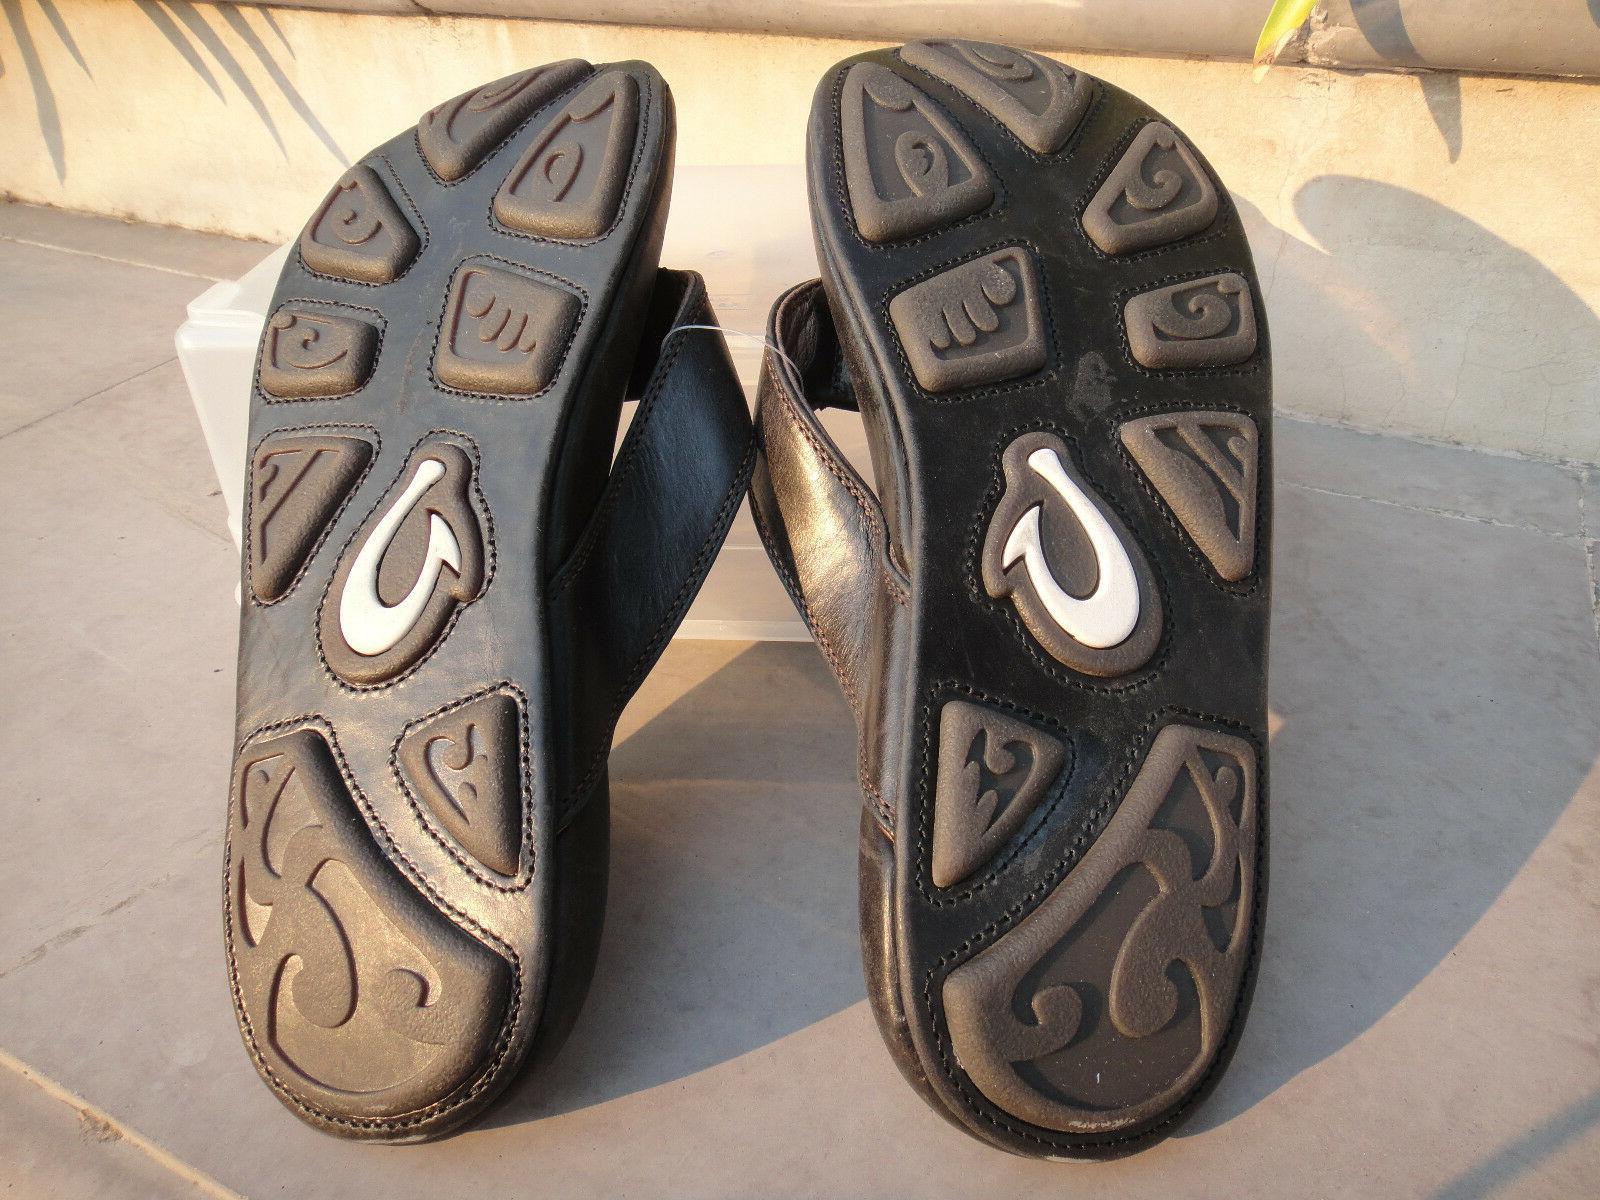 OluKai Leather Stitched Sole, 10M 10317-4040